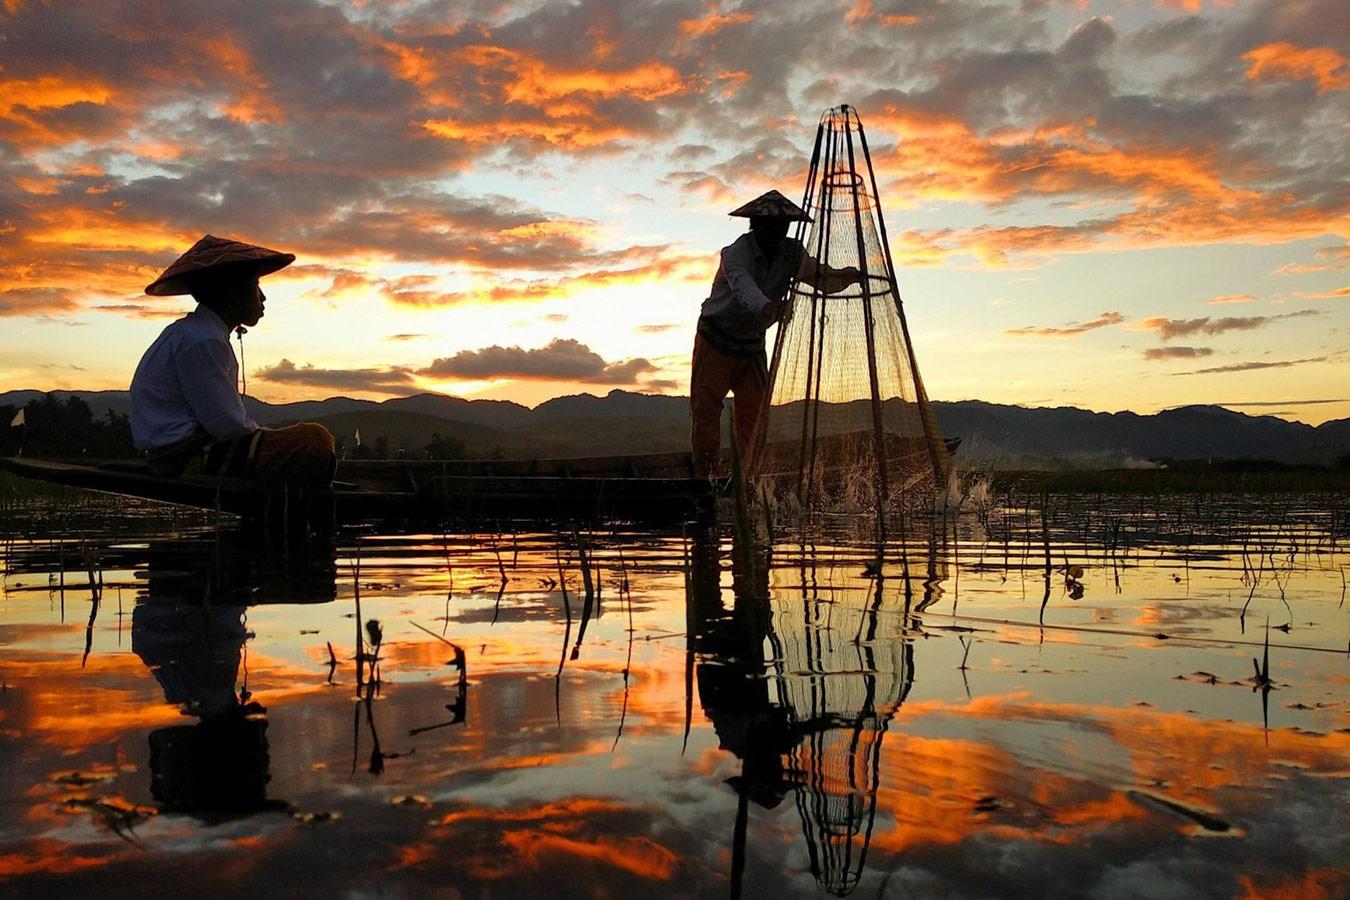 © Aung Thu Hein, Myanmar, Xiaomi Photography Challenge